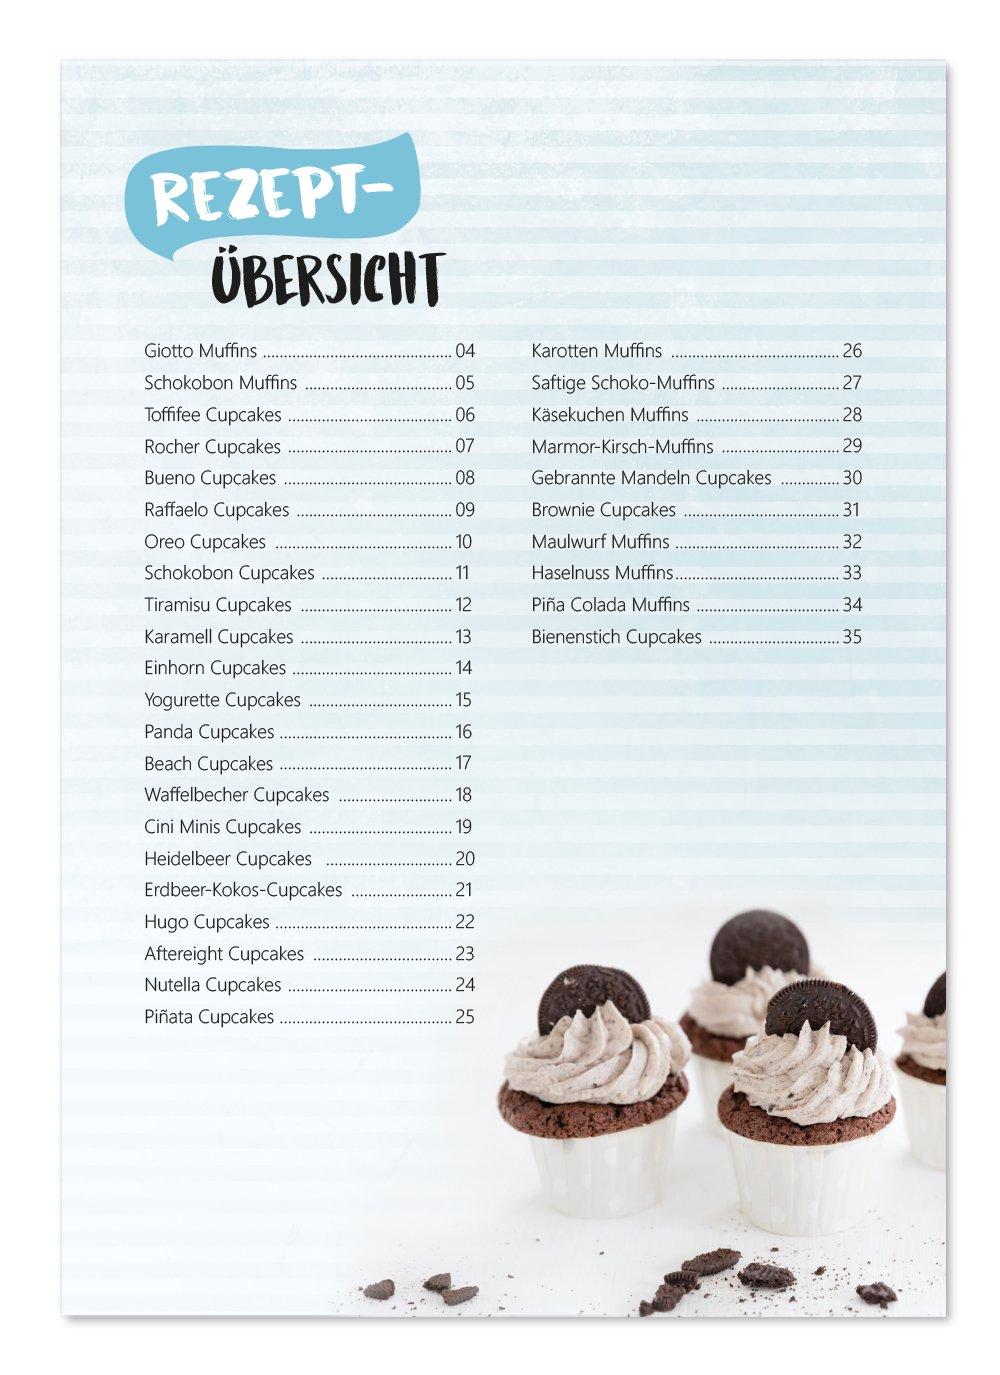 Cupcakes Muffins Susses Aus Dem Thermomix Amazon De C T Wild